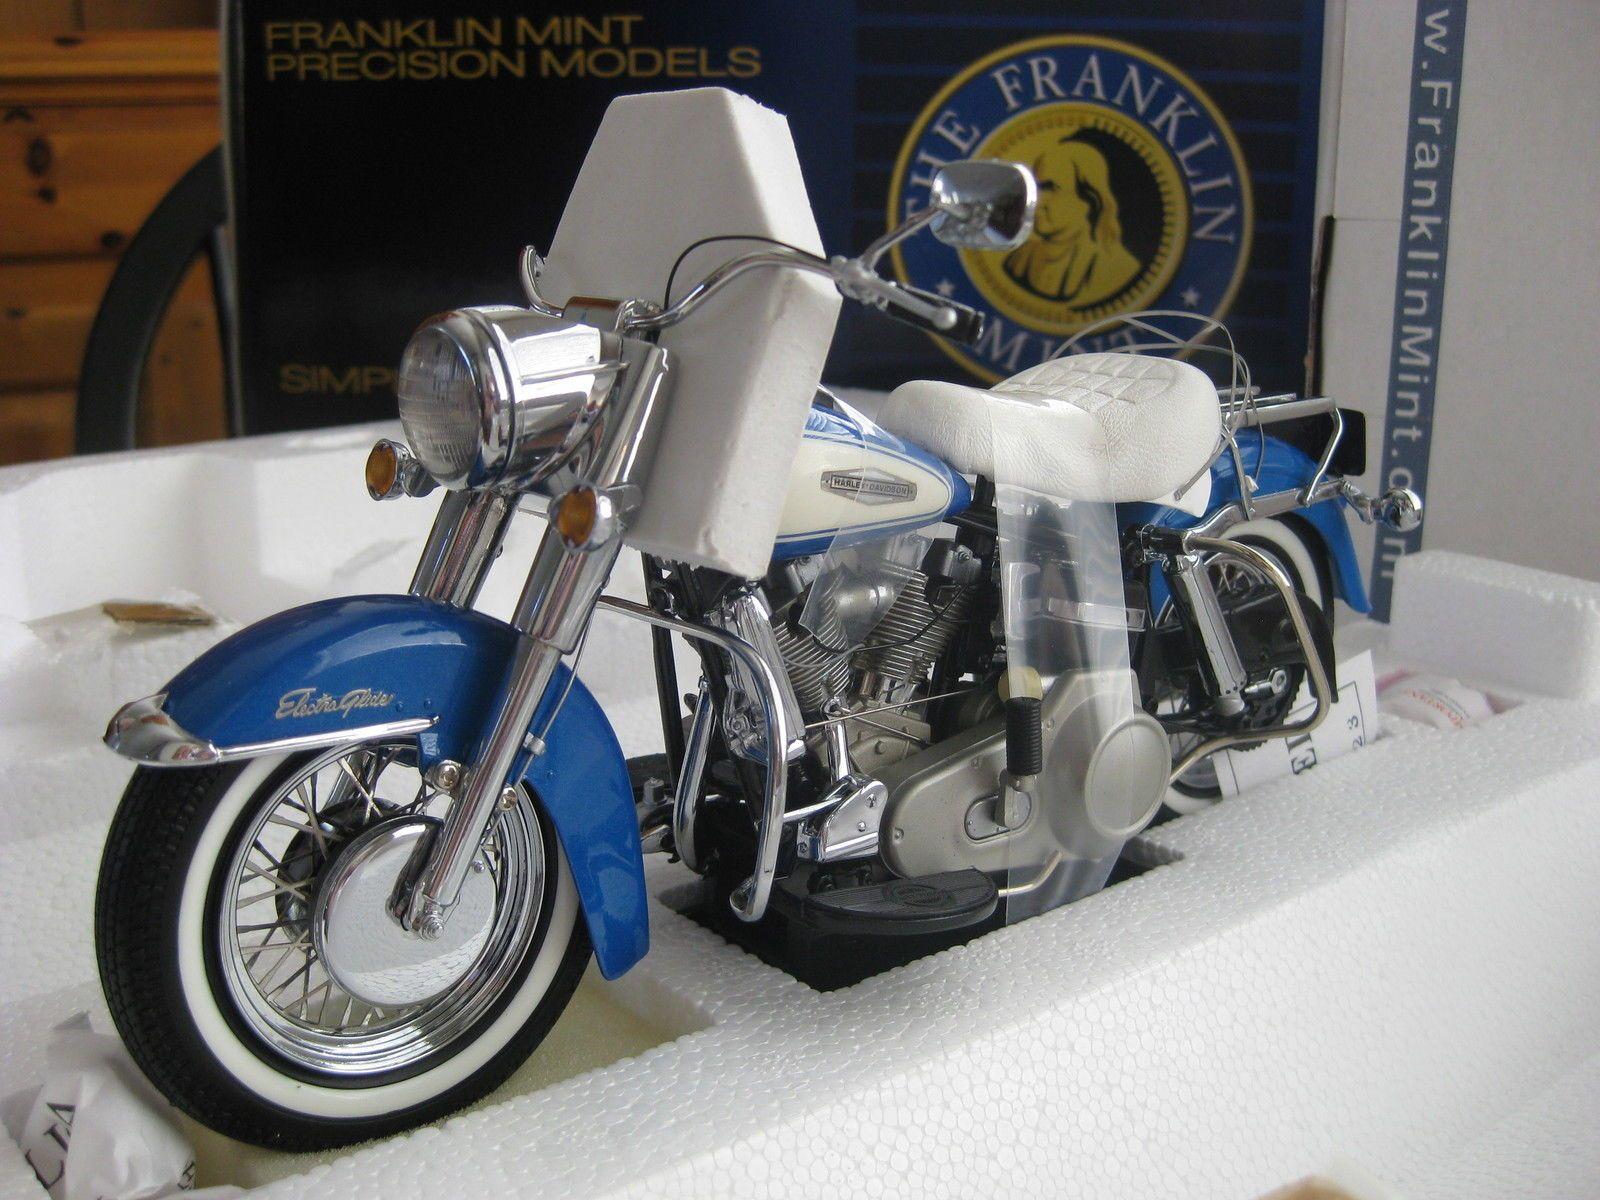 Franklin Mint B11f076 Harley Davidson 1966 Flh Electra Glide